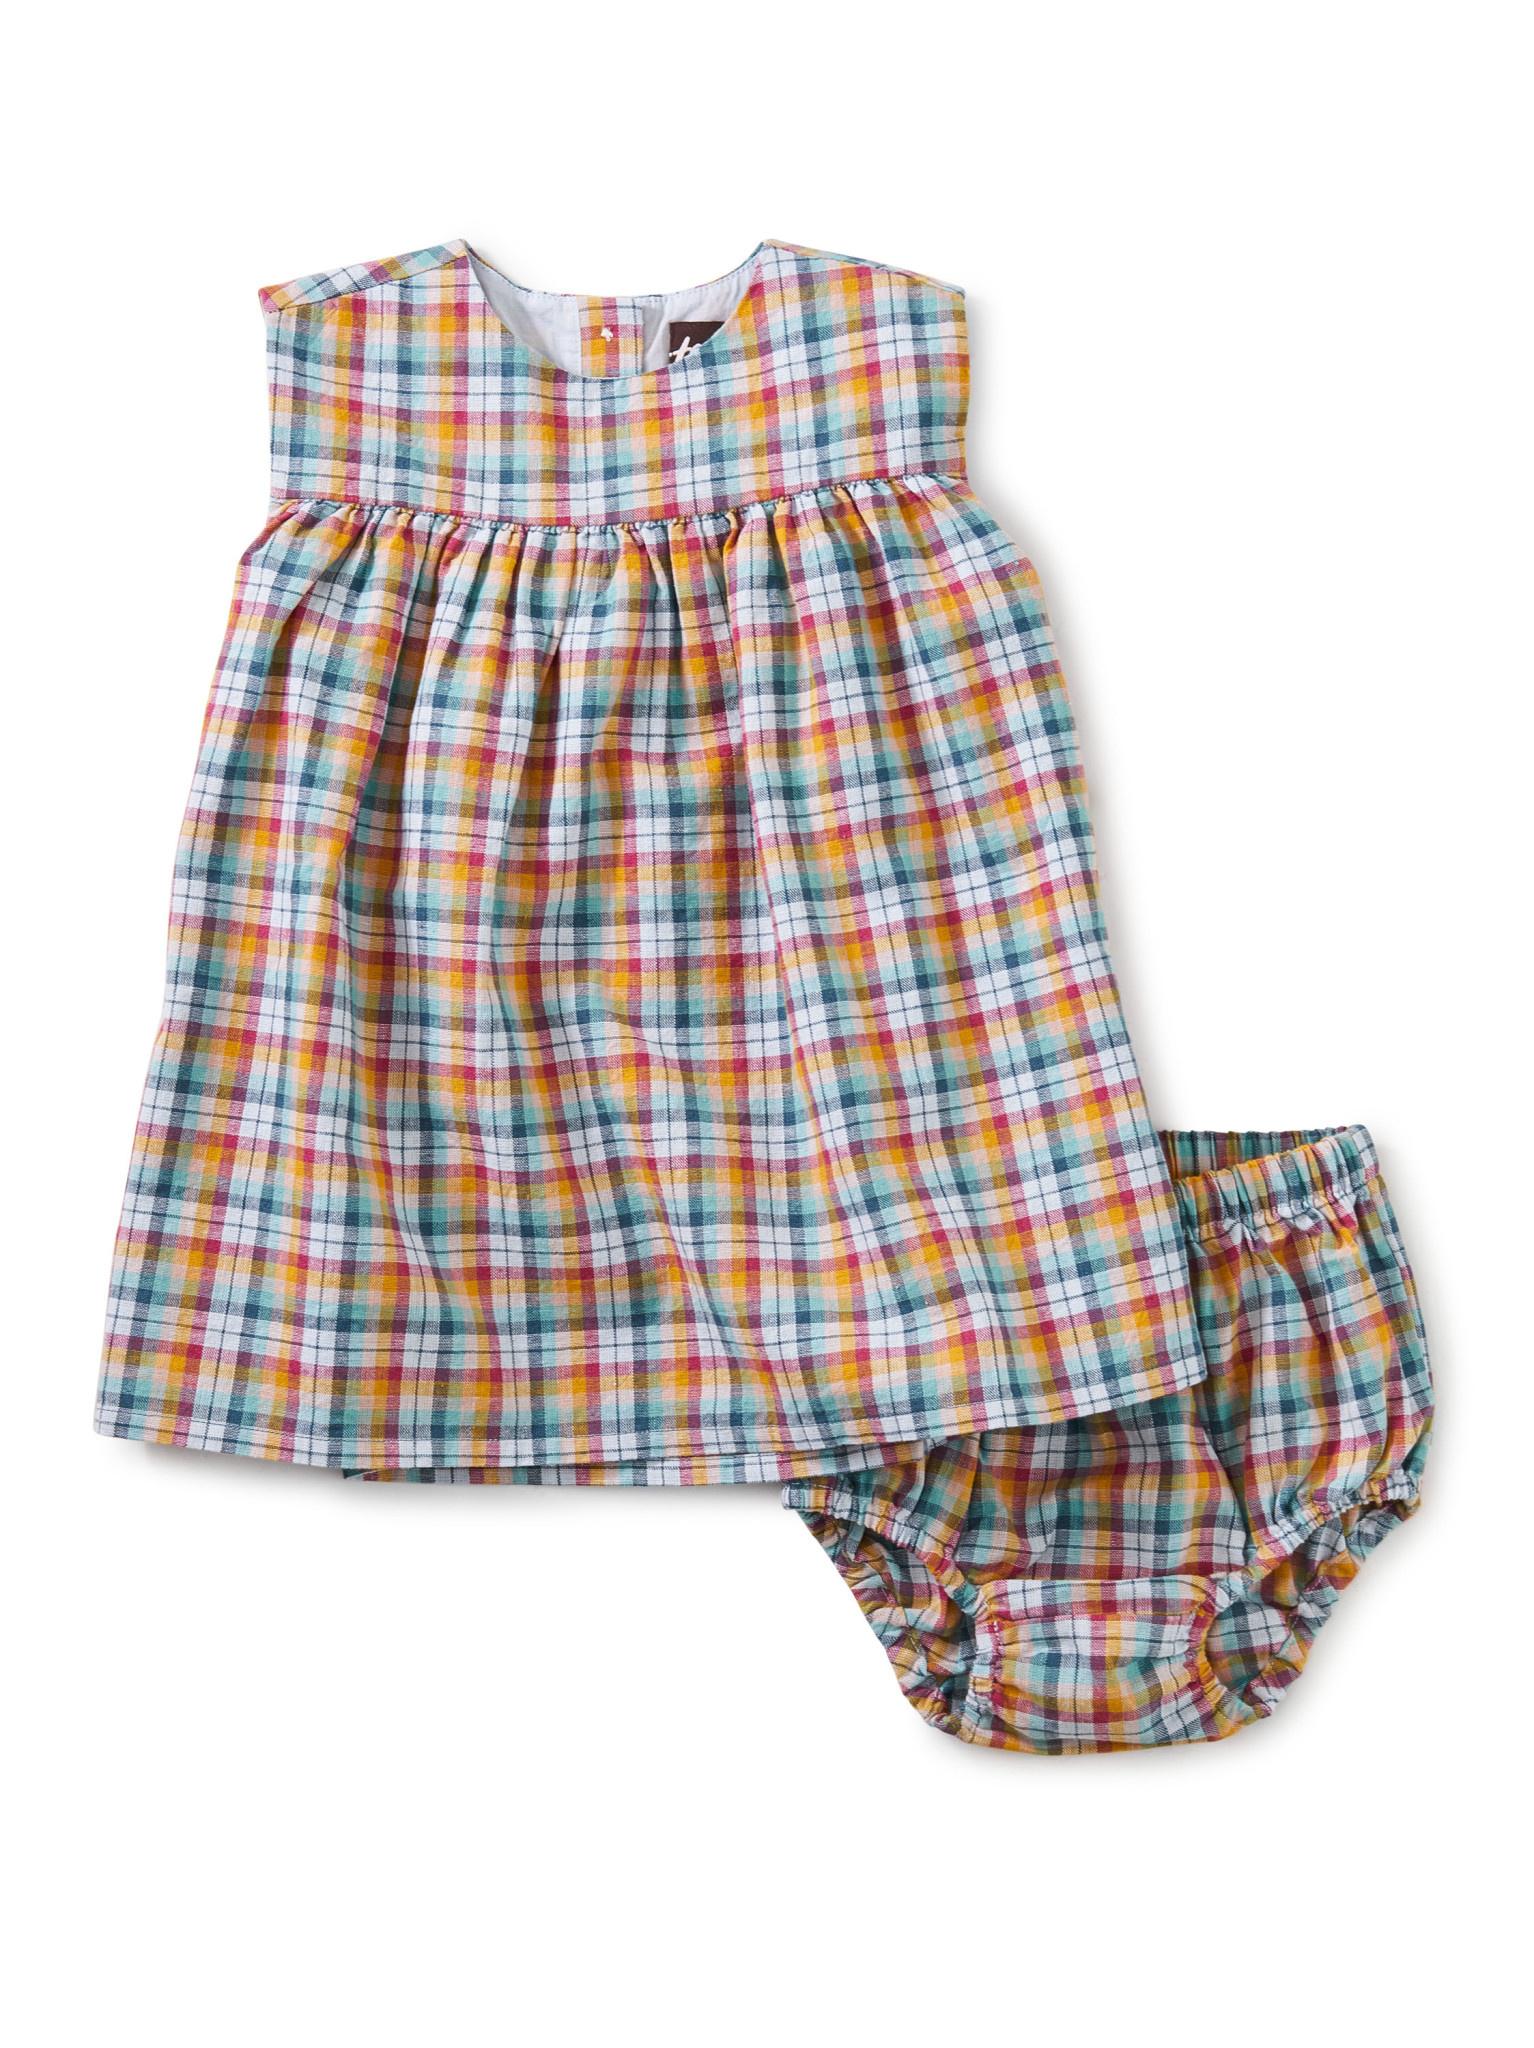 Tea Collection Empire Baby Dress Set- Spring Plaid